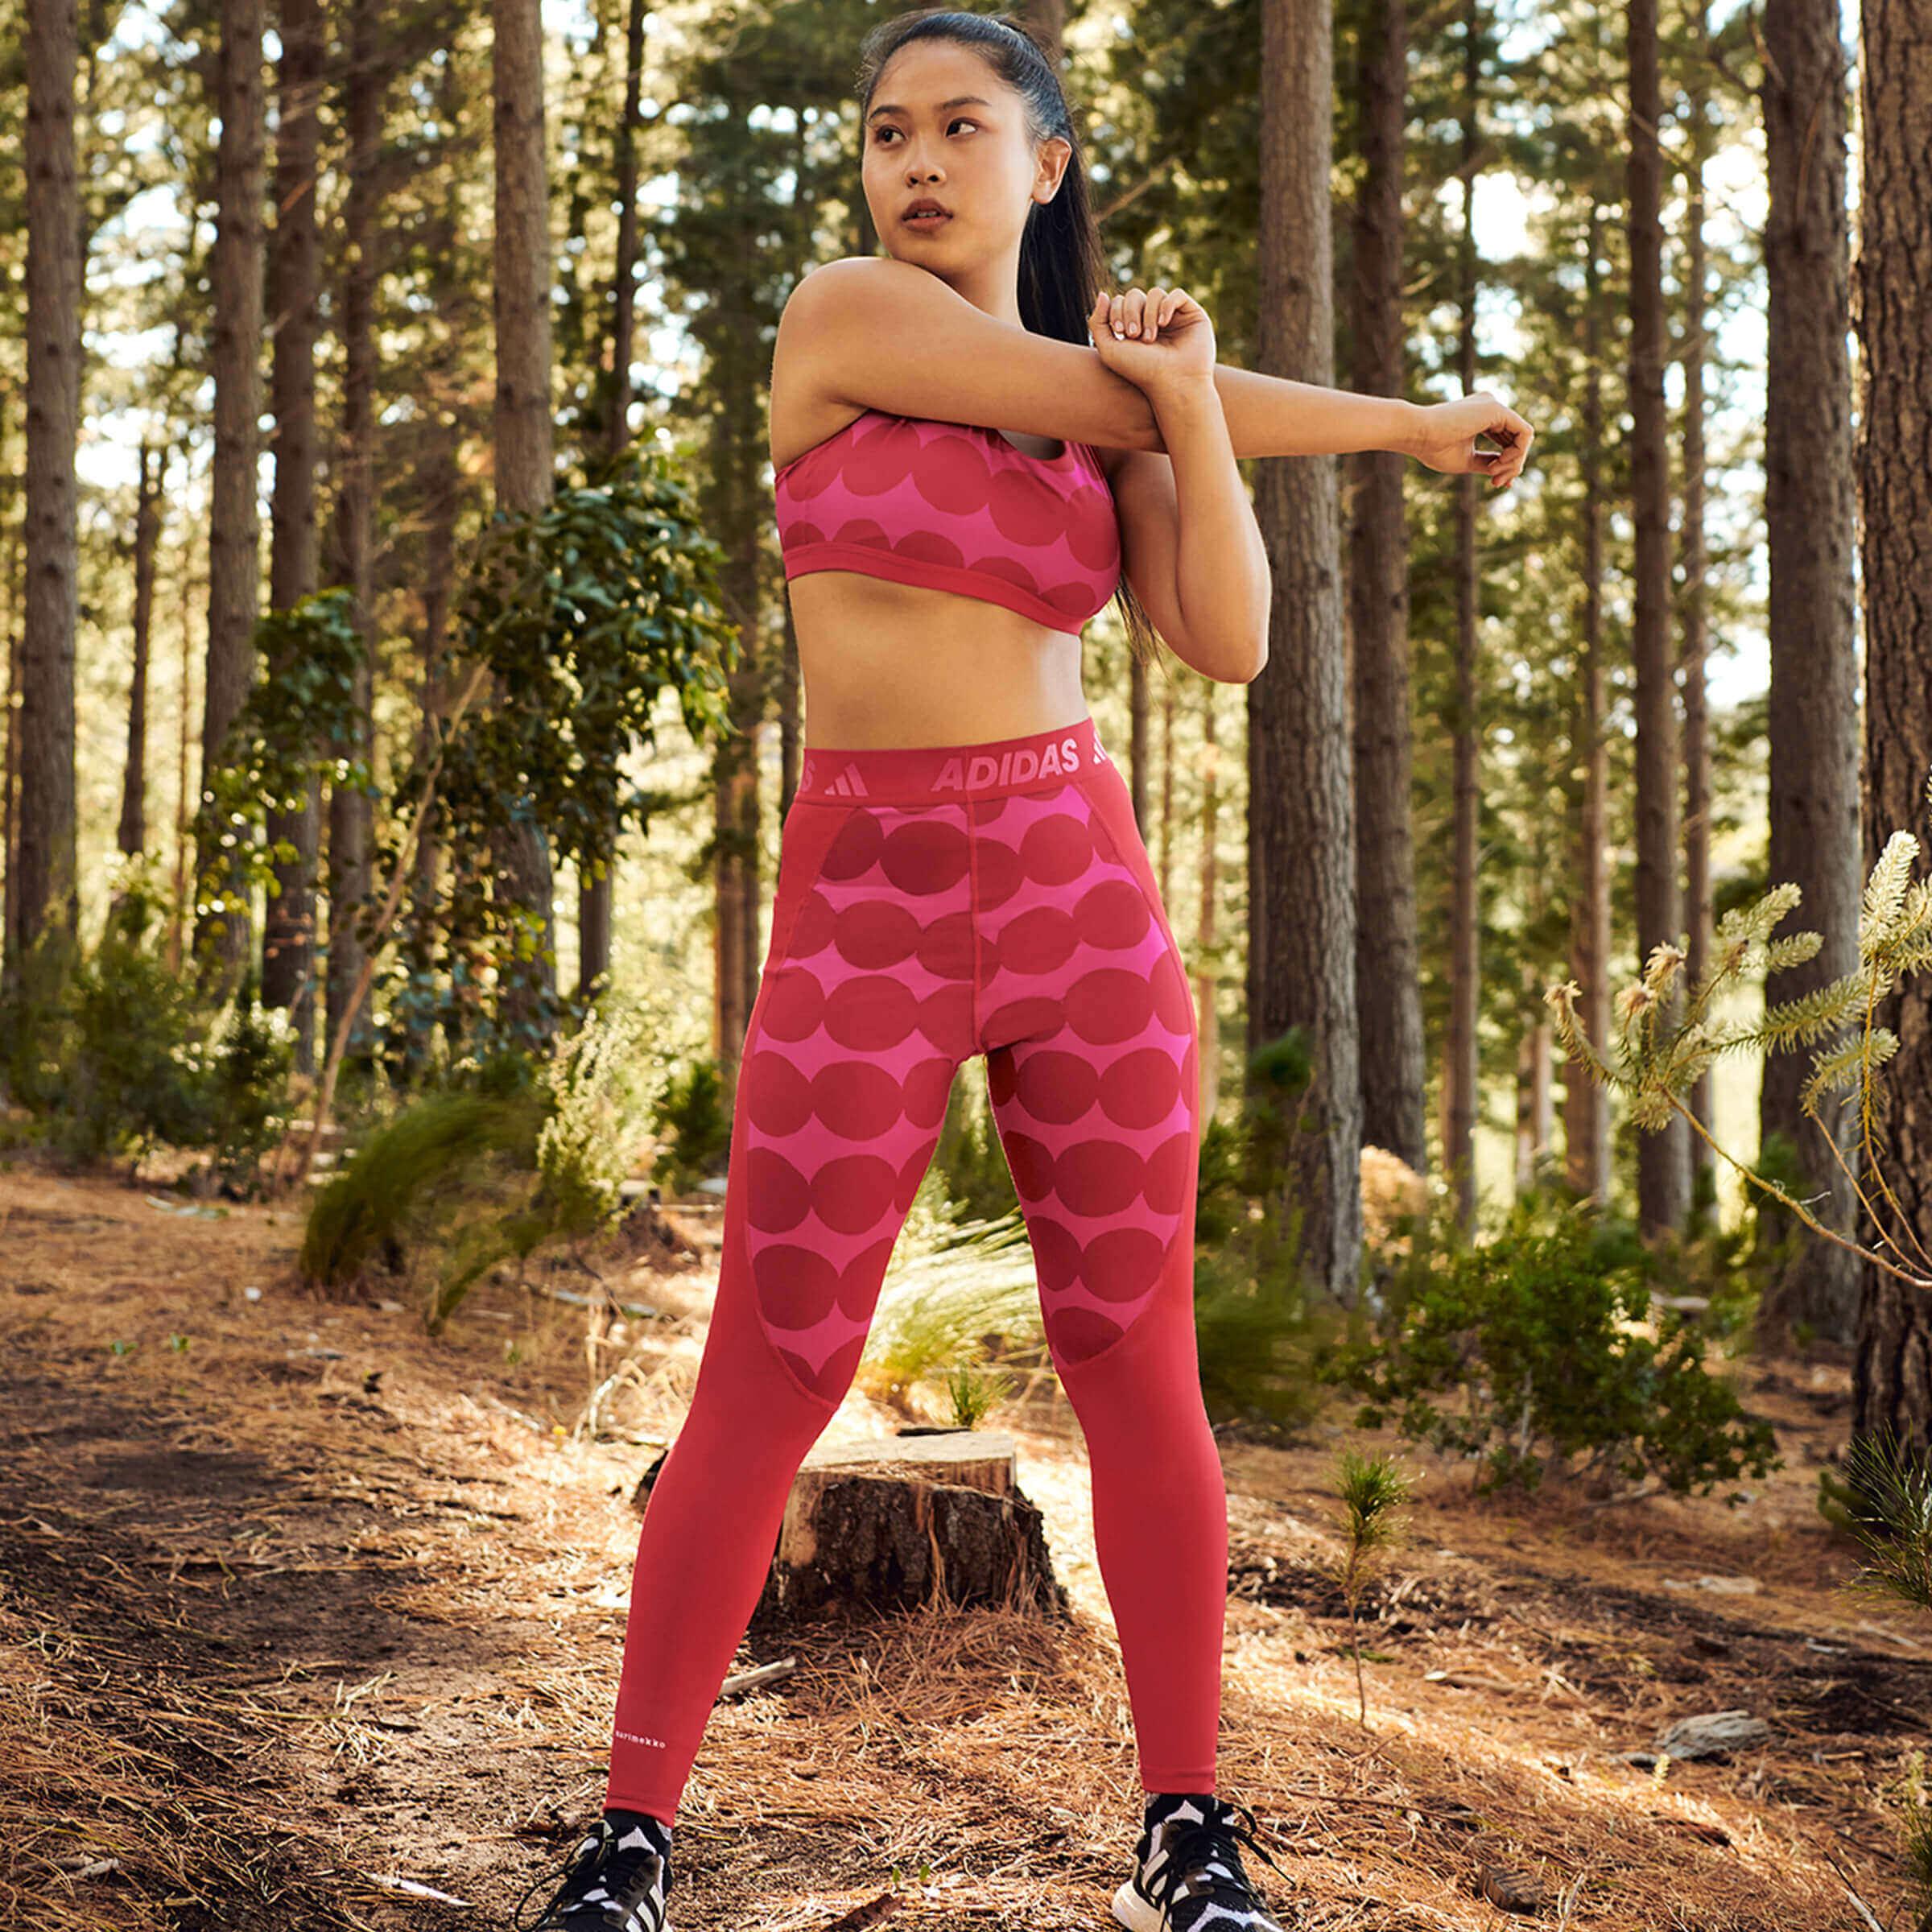 Adidas x Marimekko Graphic Cycling Jersey